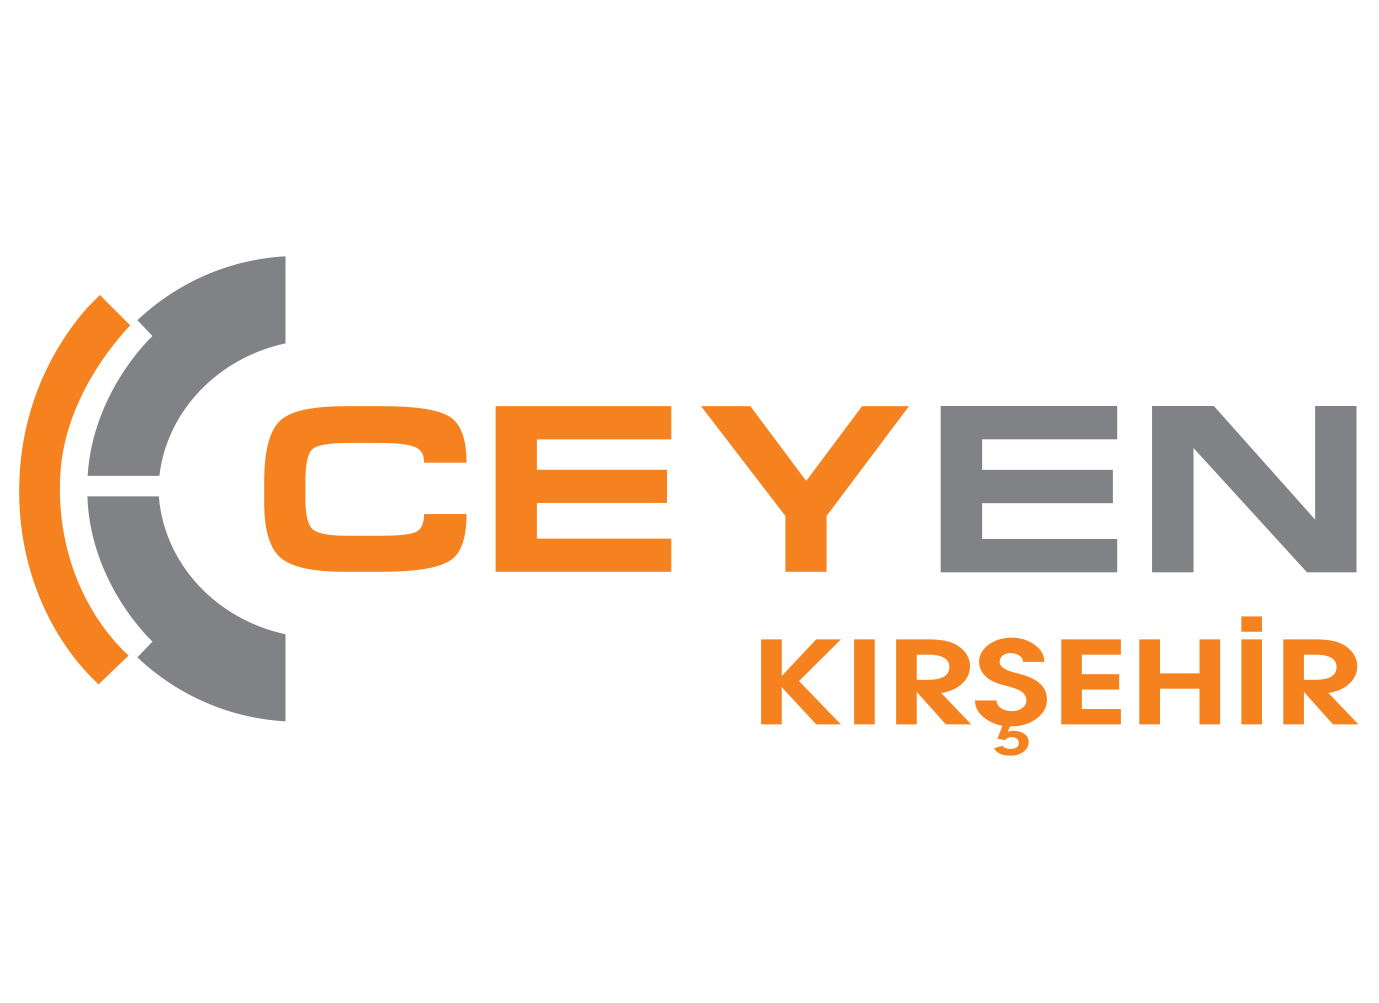 Ceyen Kırşehir